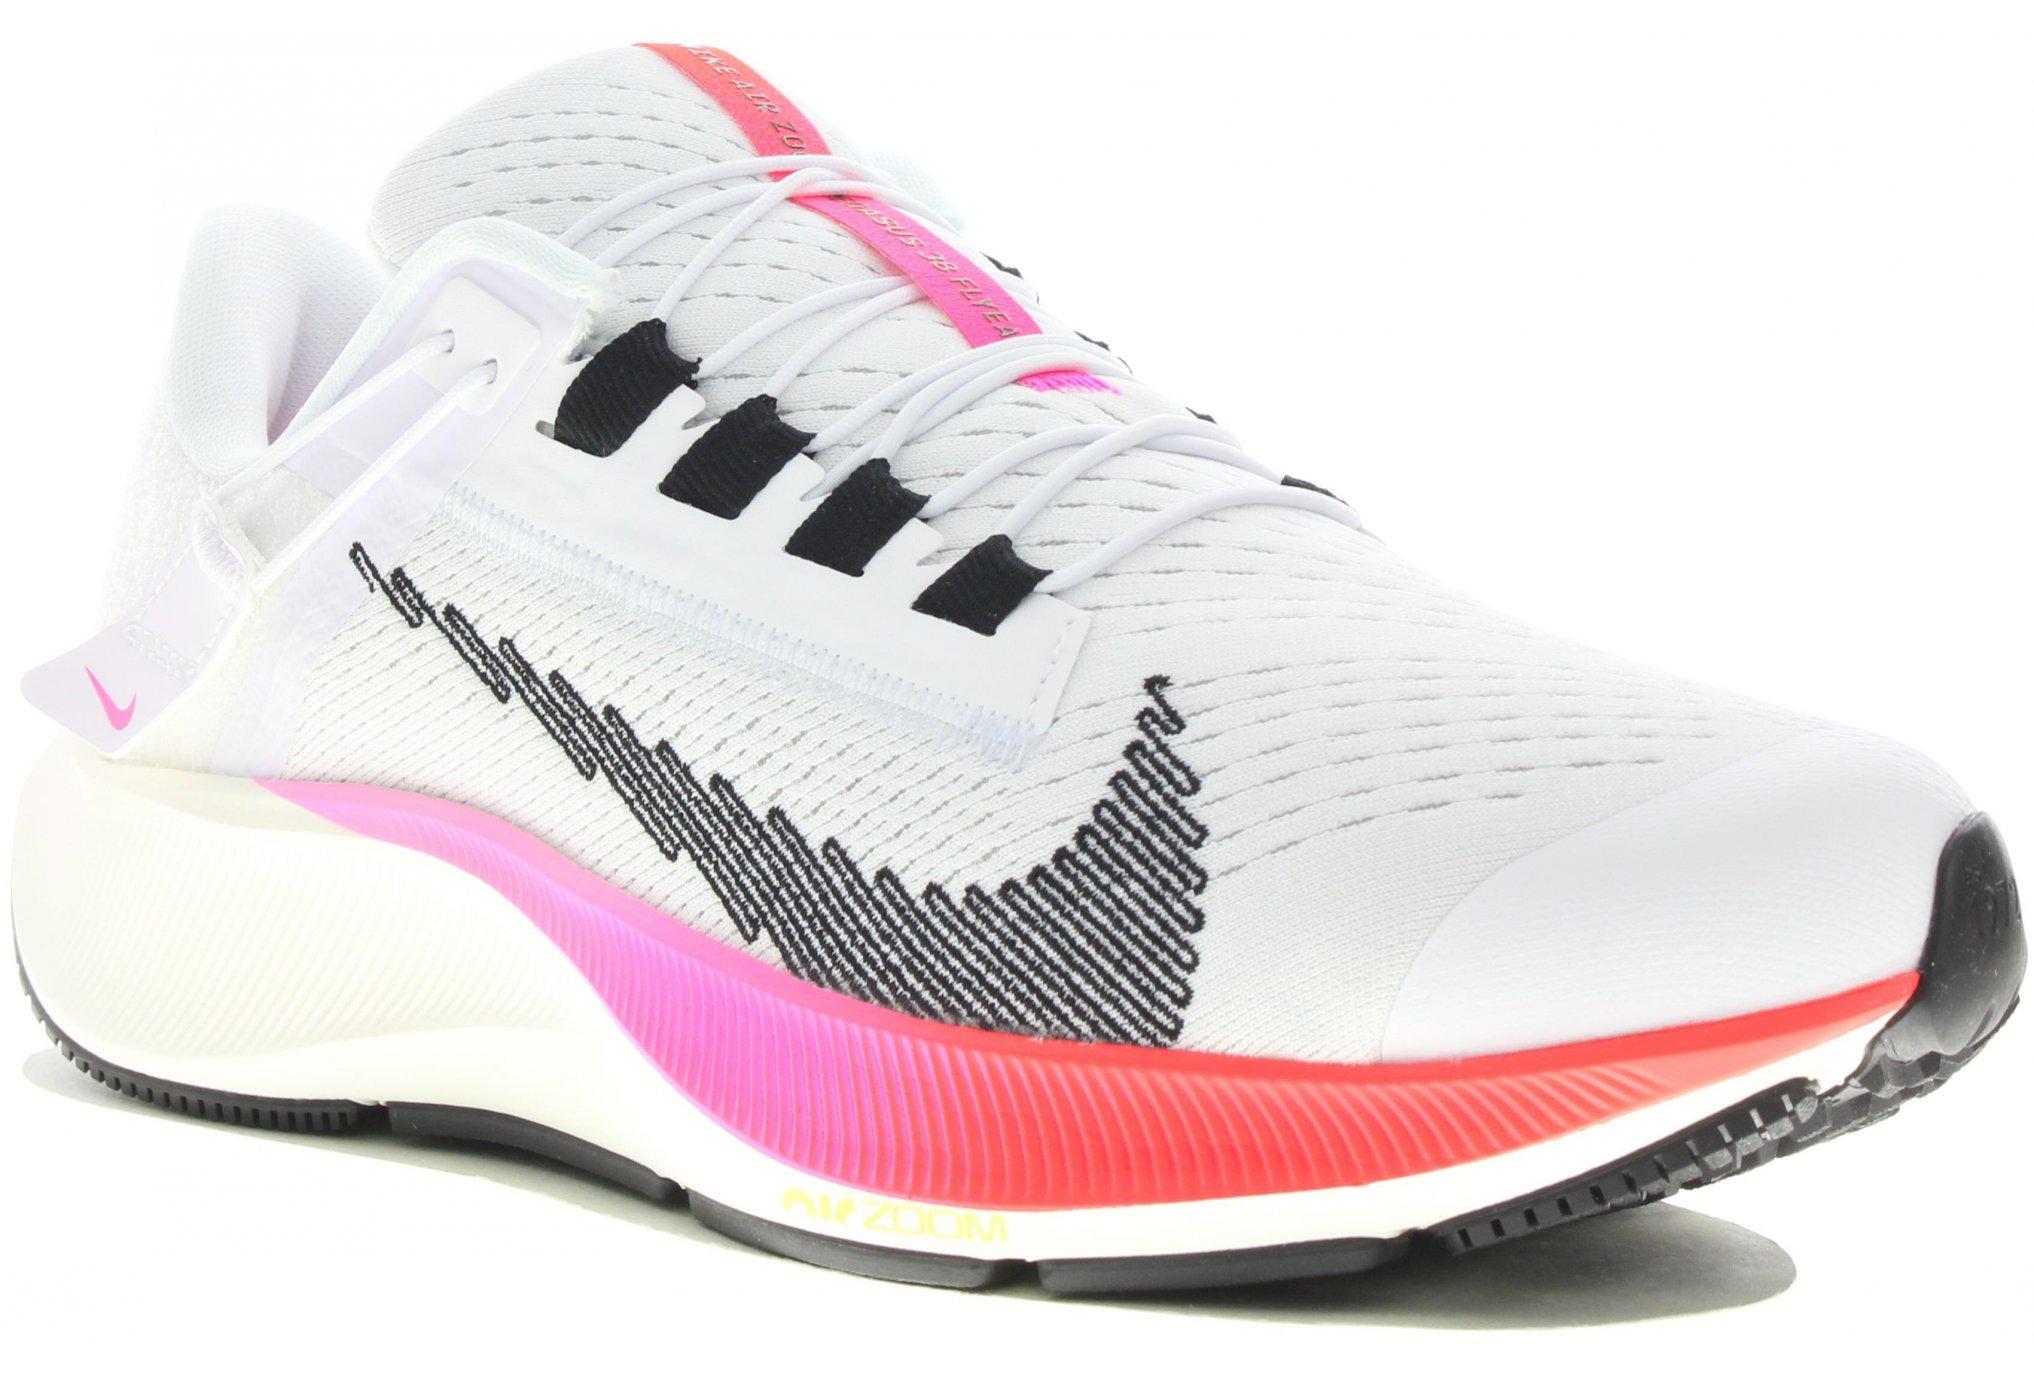 Nike Air Zoom Pegasus 38 FlyEase Rawdacious W Chaussures running femme